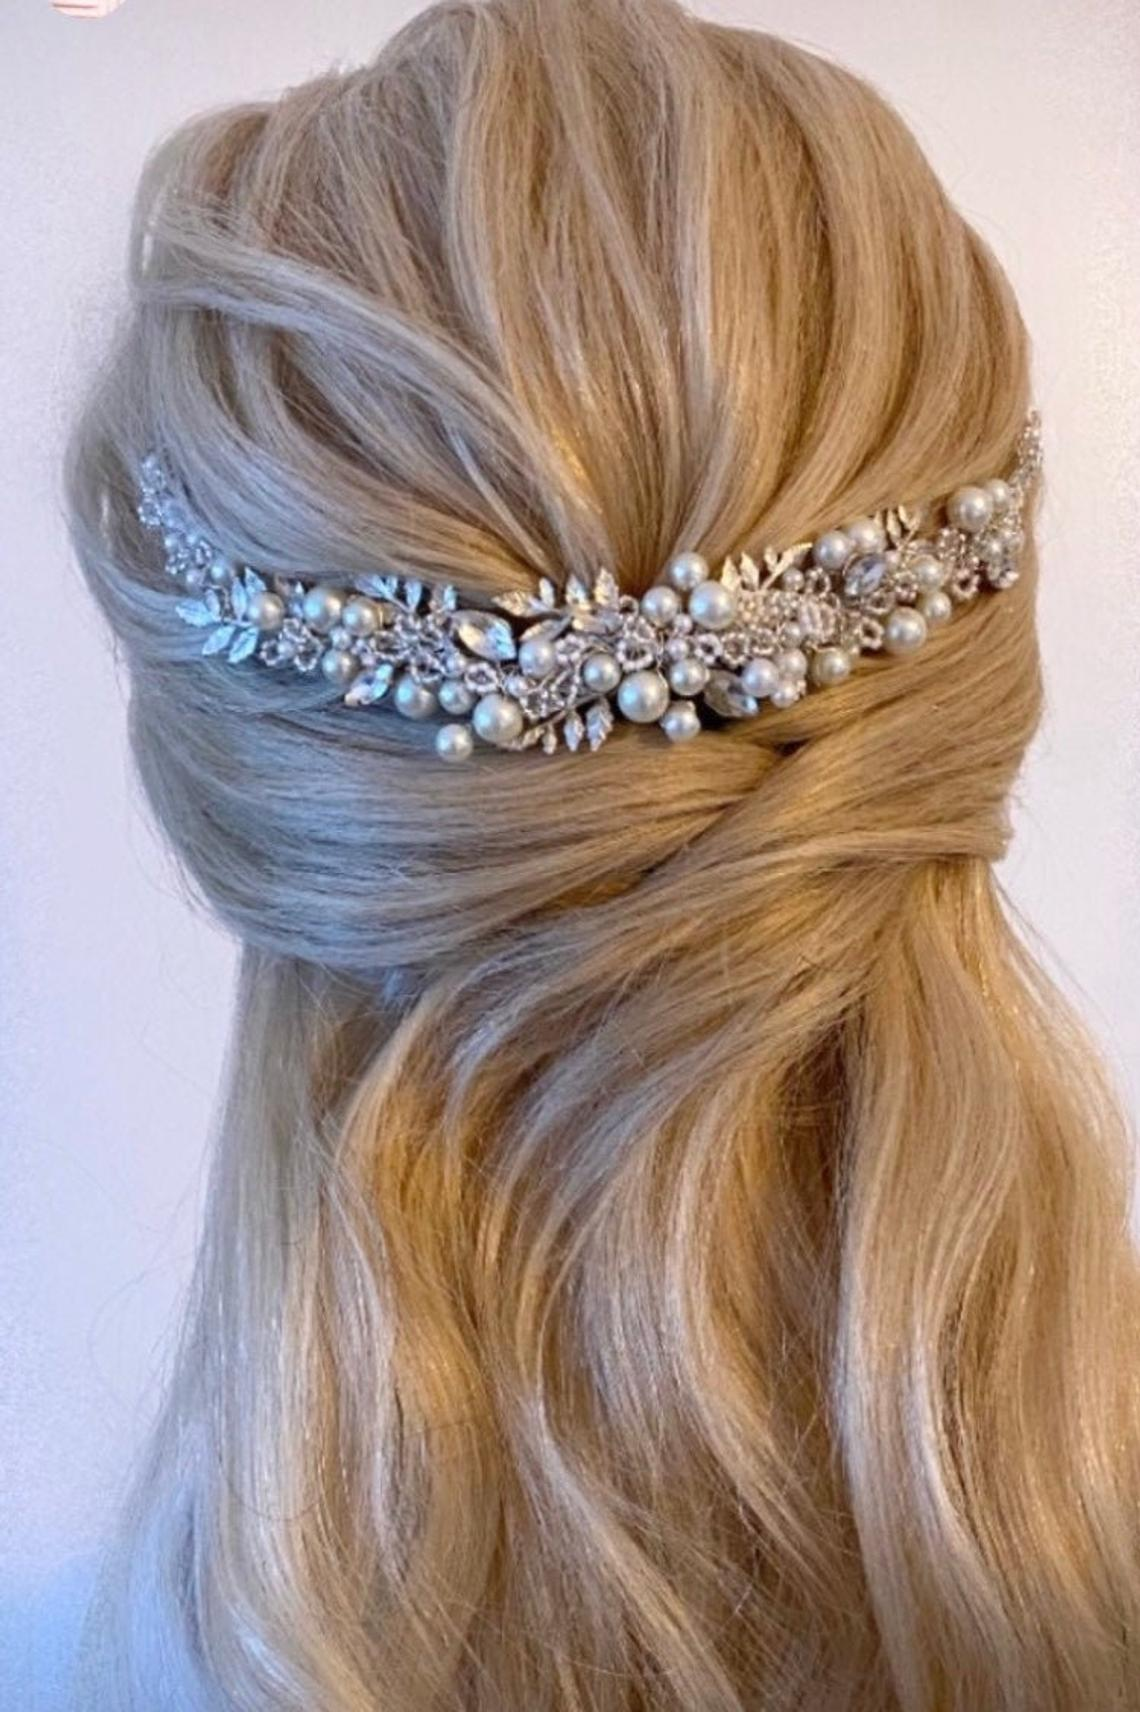 Evie Bridal Hairpiece, Wedding Hair Accessories, Bridal Hairvine, Bride's Comb, Hair Adornment, Pearl, Crystal, Handmade